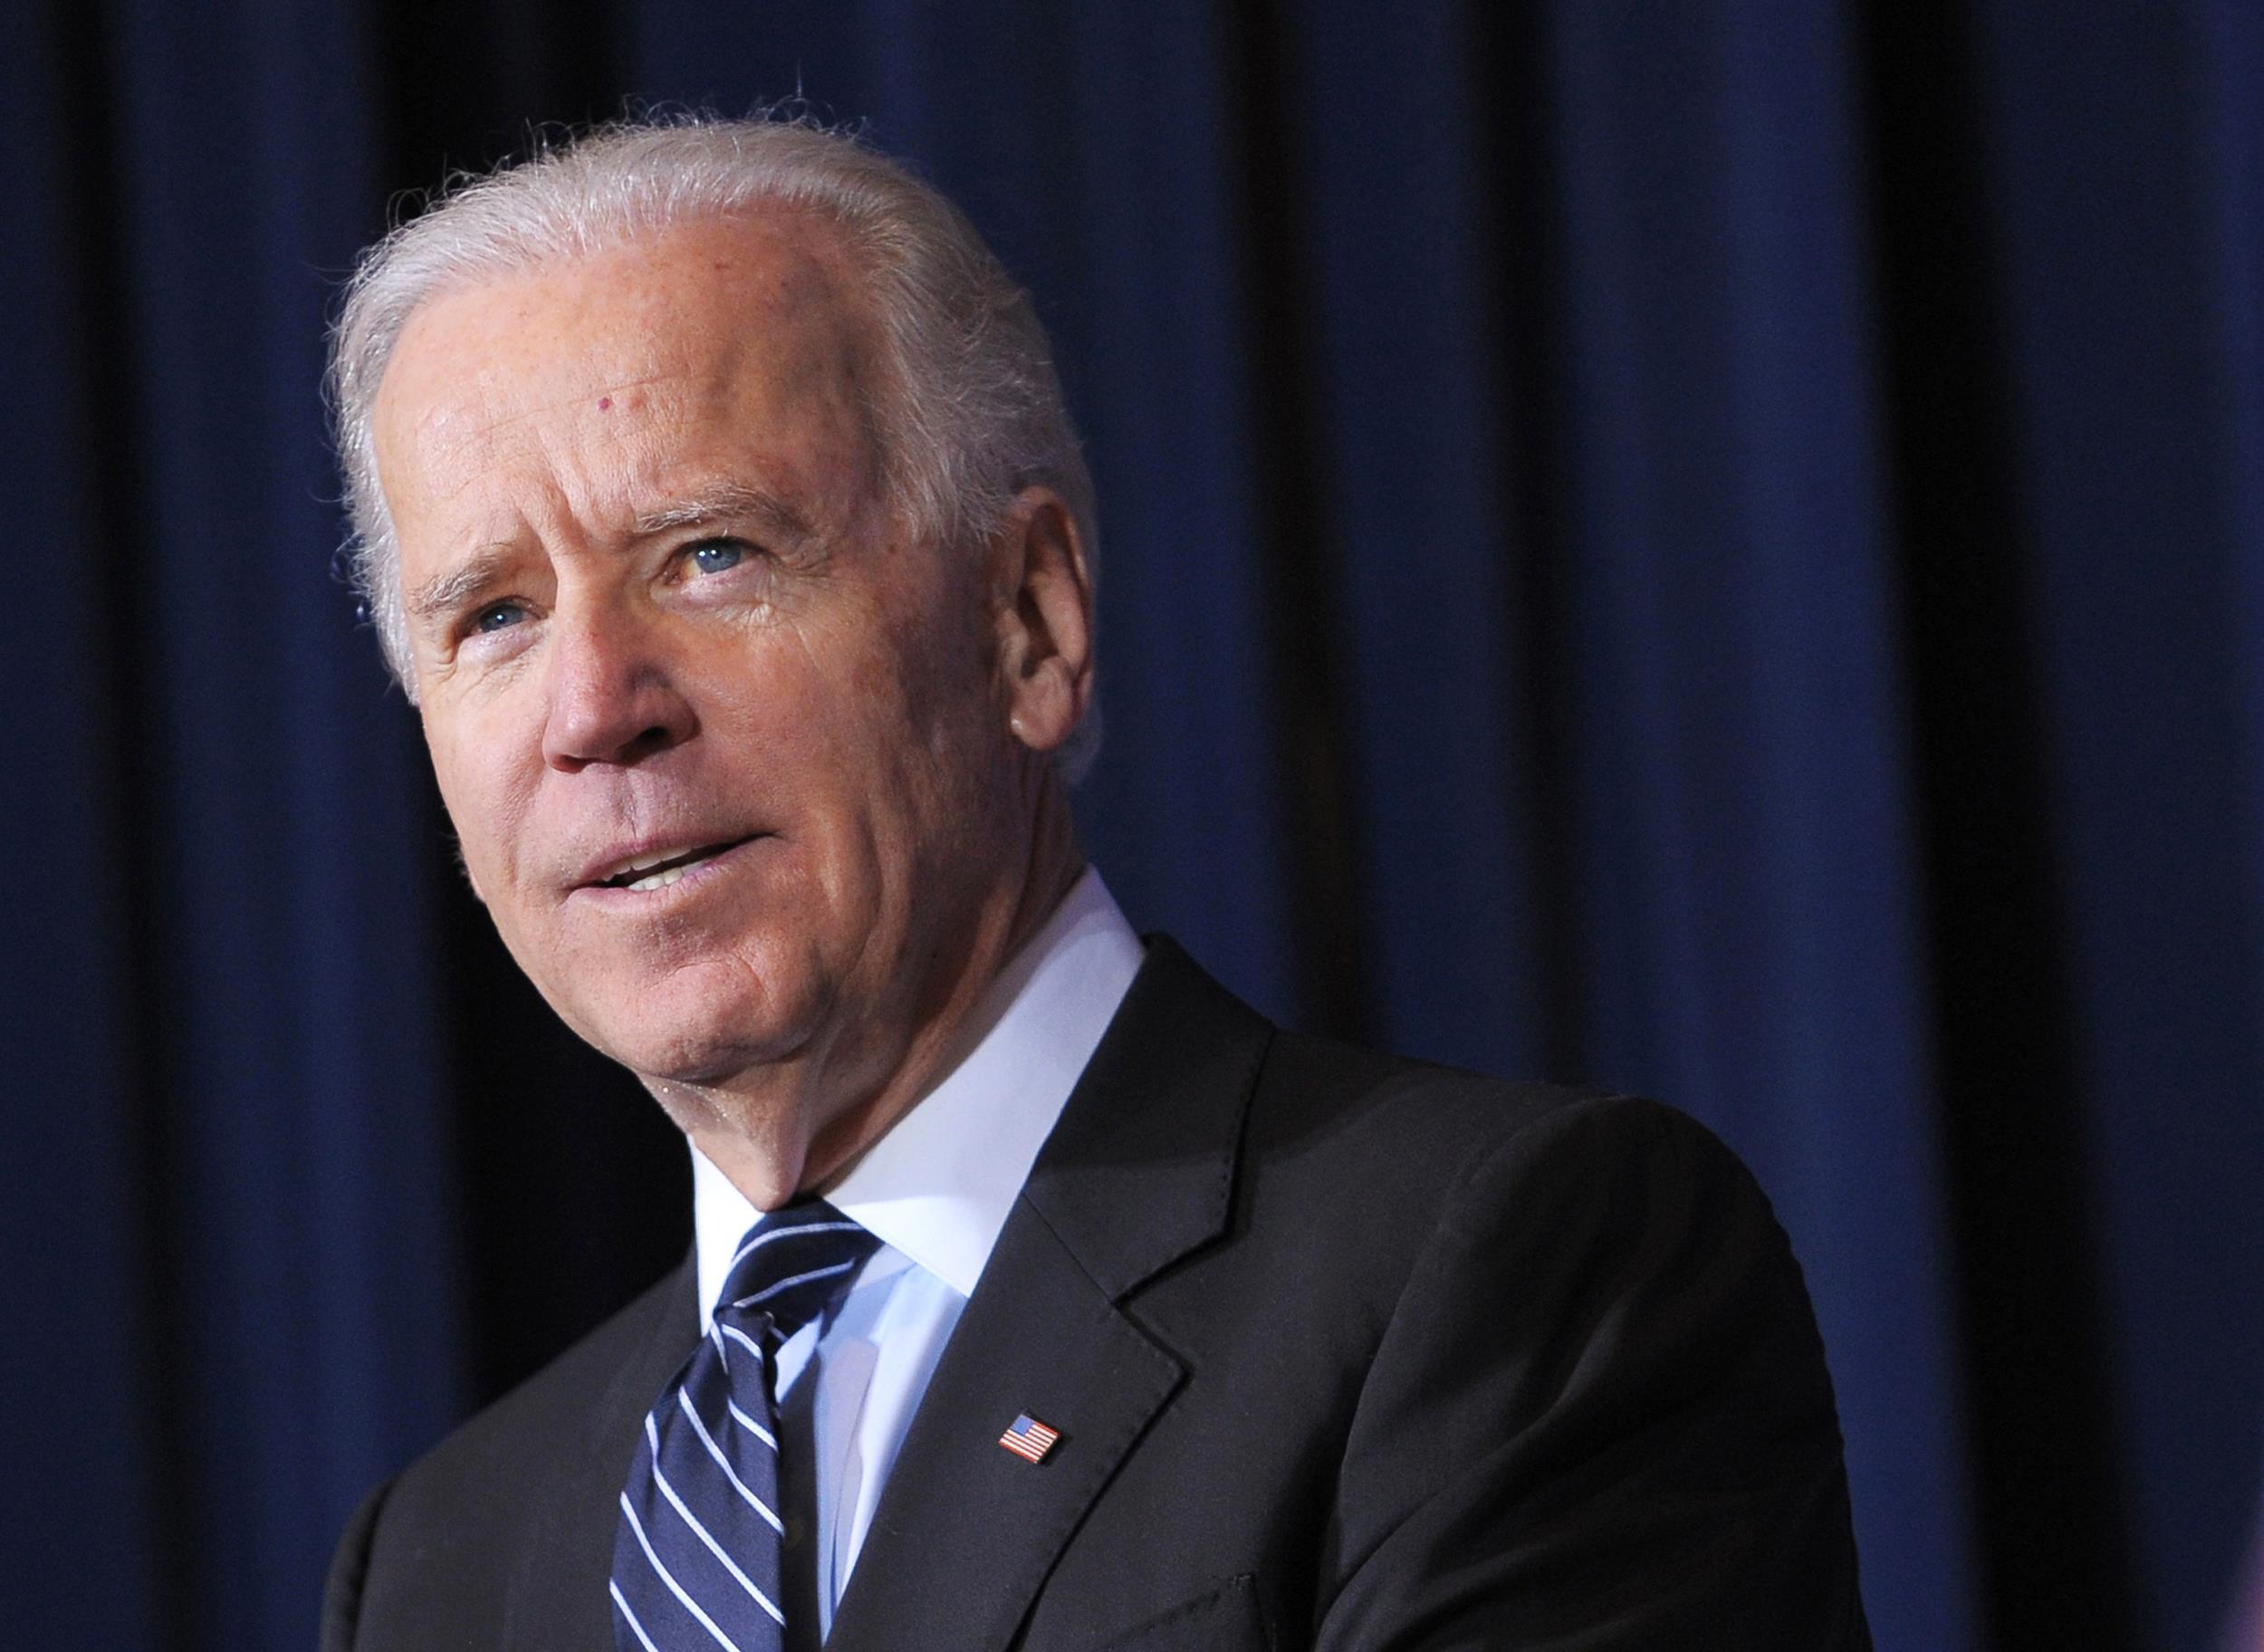 Image: U.S. Vice President Joe Biden